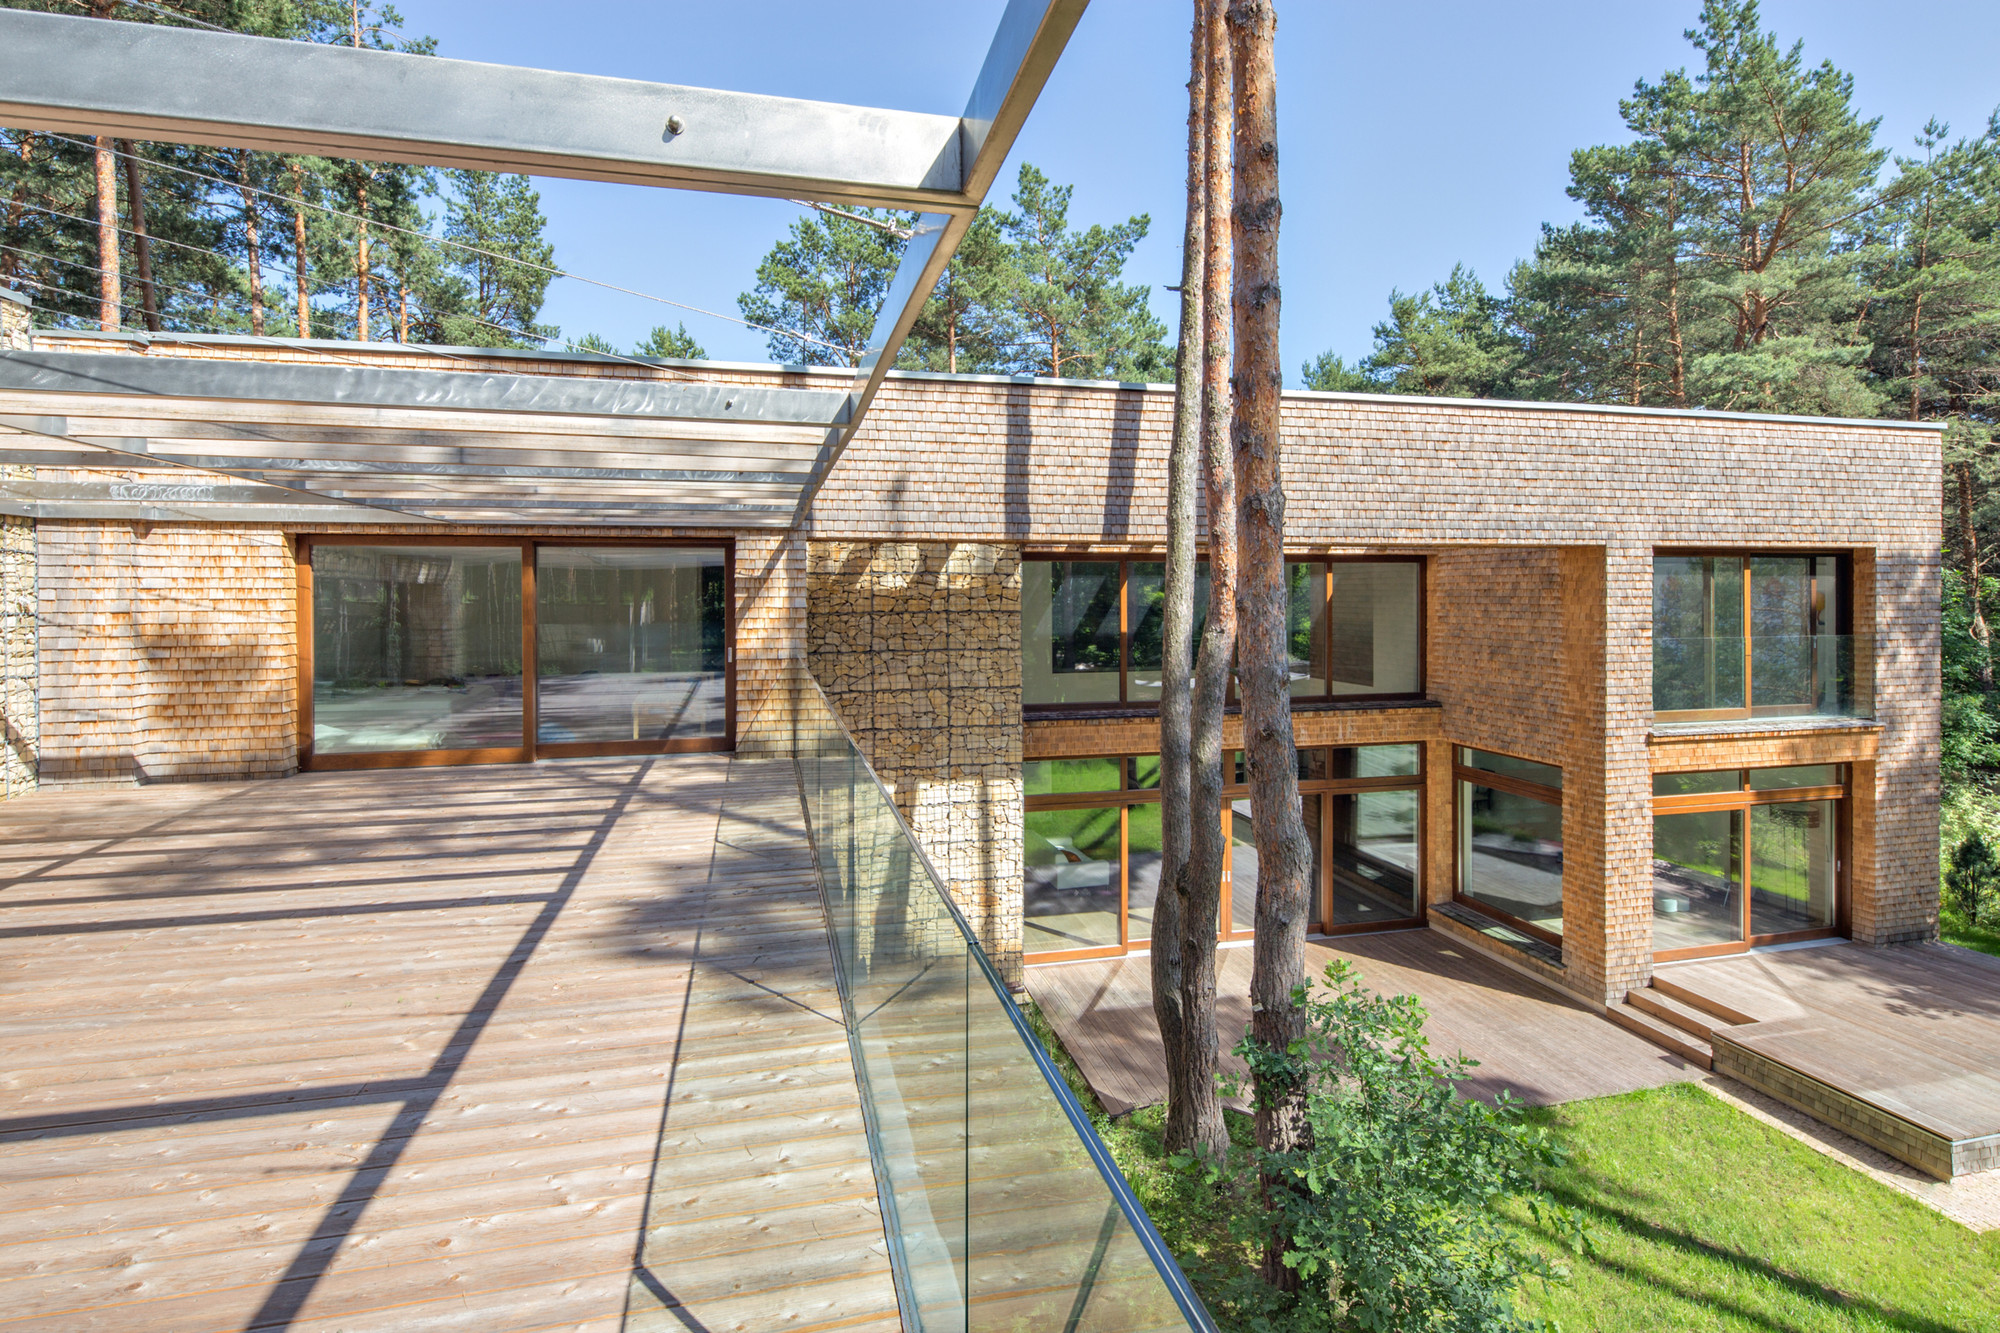 forest house biuro architektoniczne barycz saramowicz. Black Bedroom Furniture Sets. Home Design Ideas